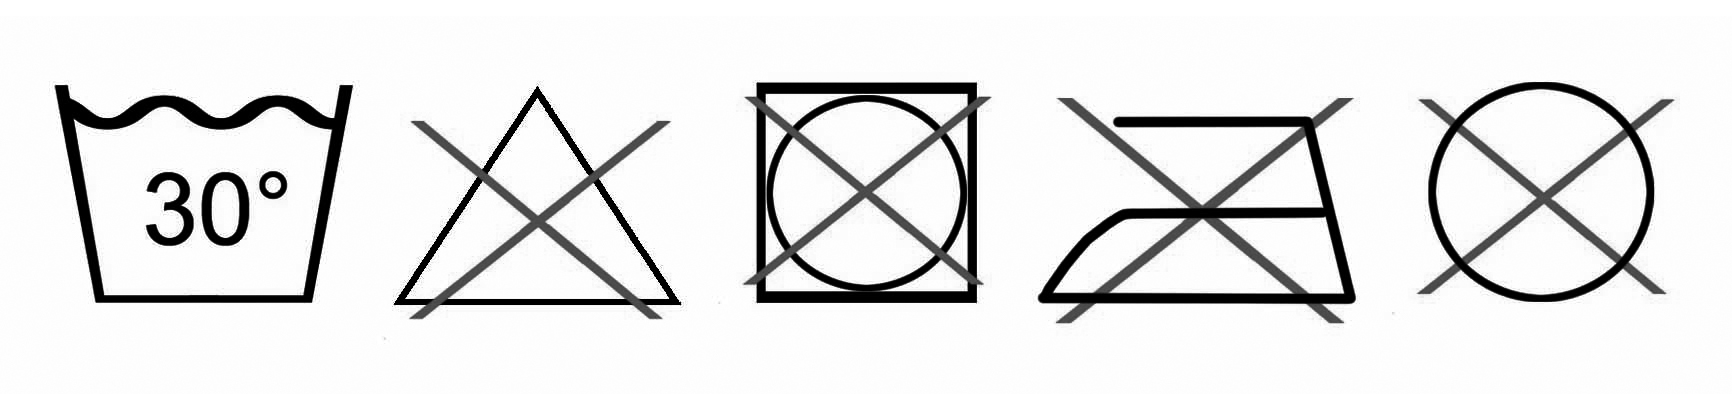 Wasch-Symbole-auf-Socken_30kQhSQR1D9Bsda